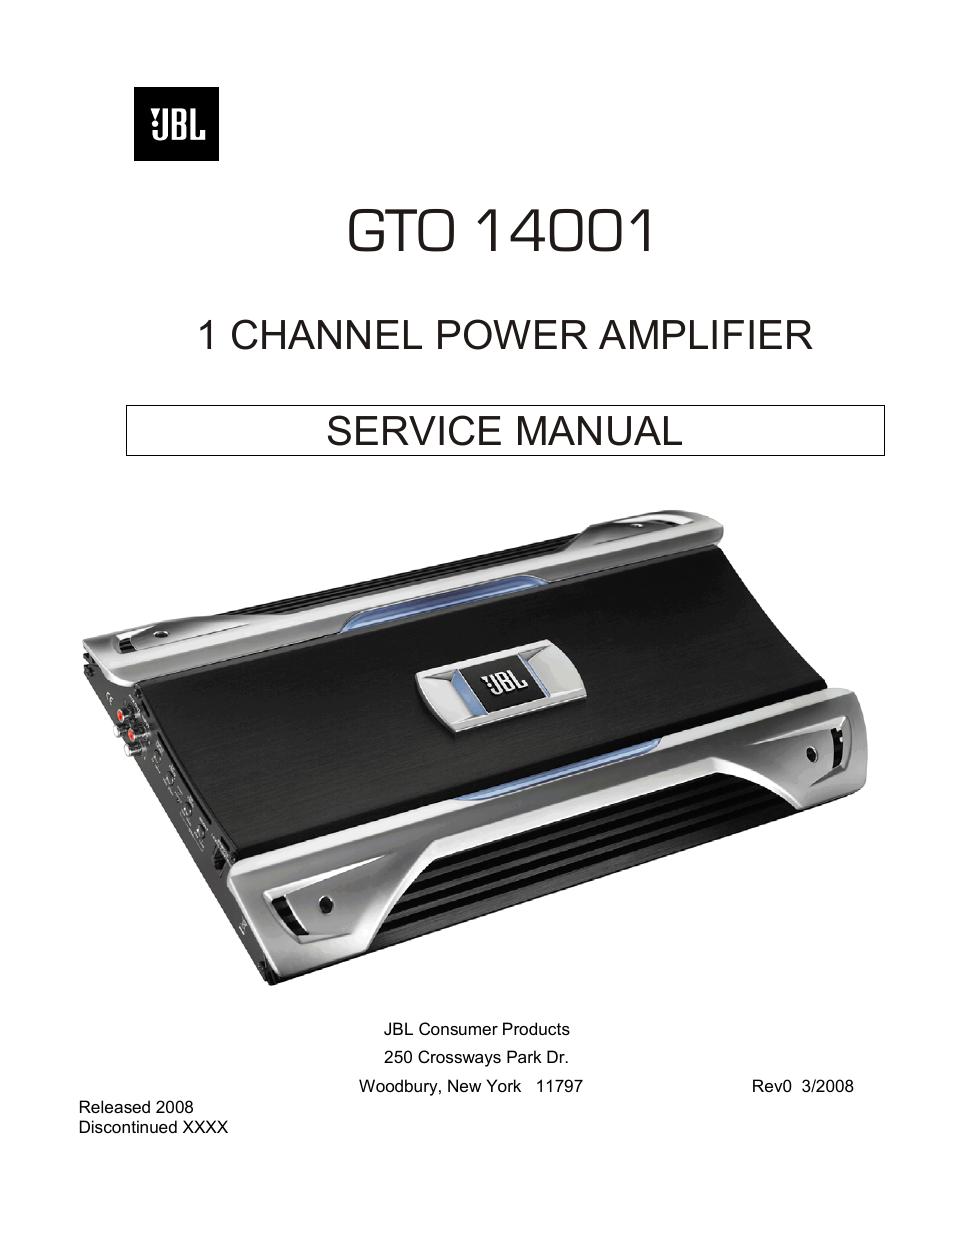 jbl gto14001 user manual 24 pages rh manualsdir com JBL Home Amplifiers jbl car amplifier service manual pdf